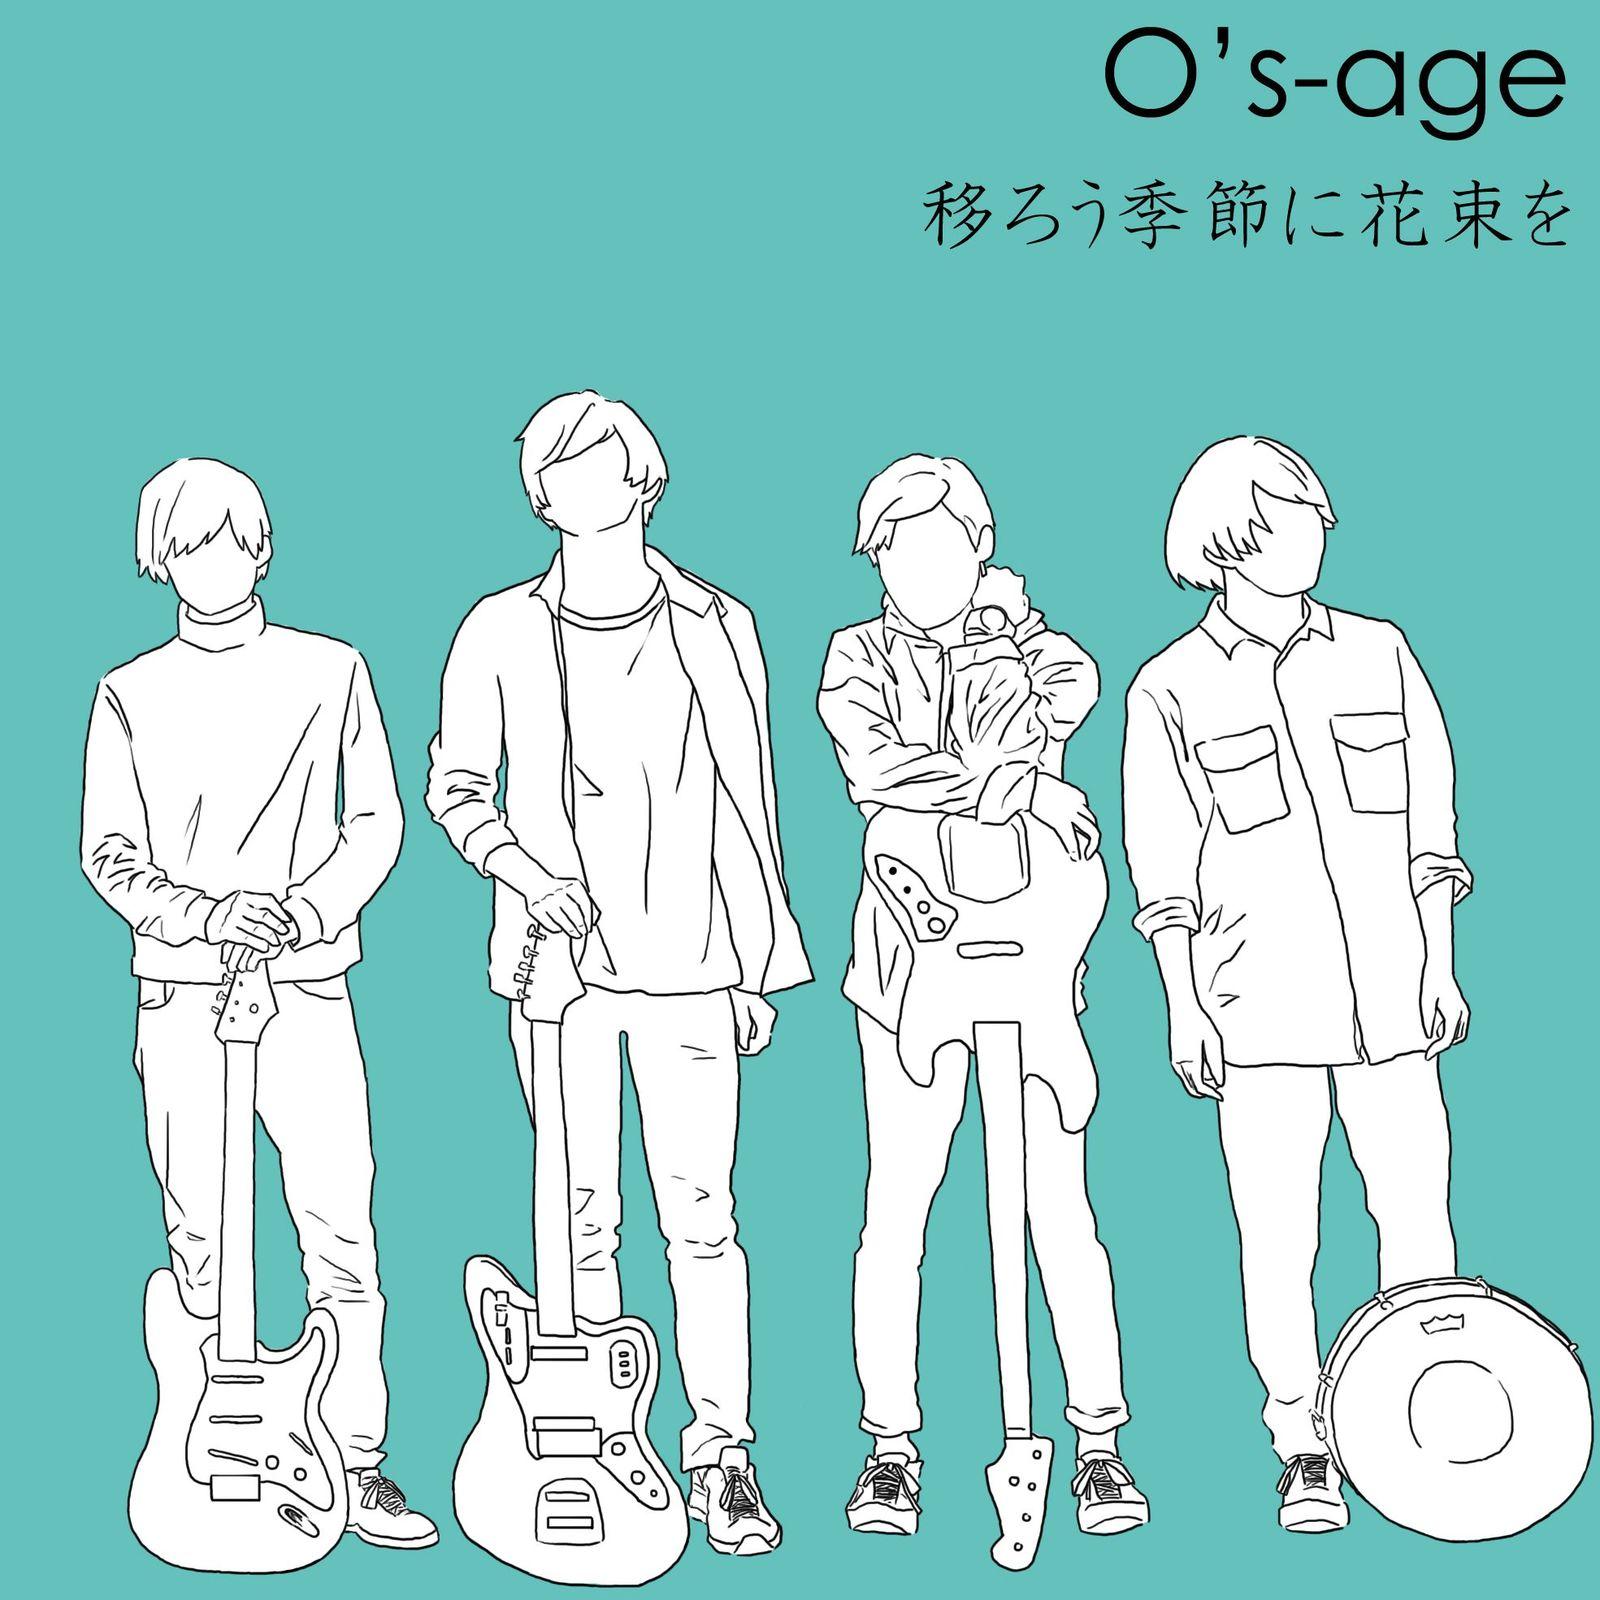 O's-age